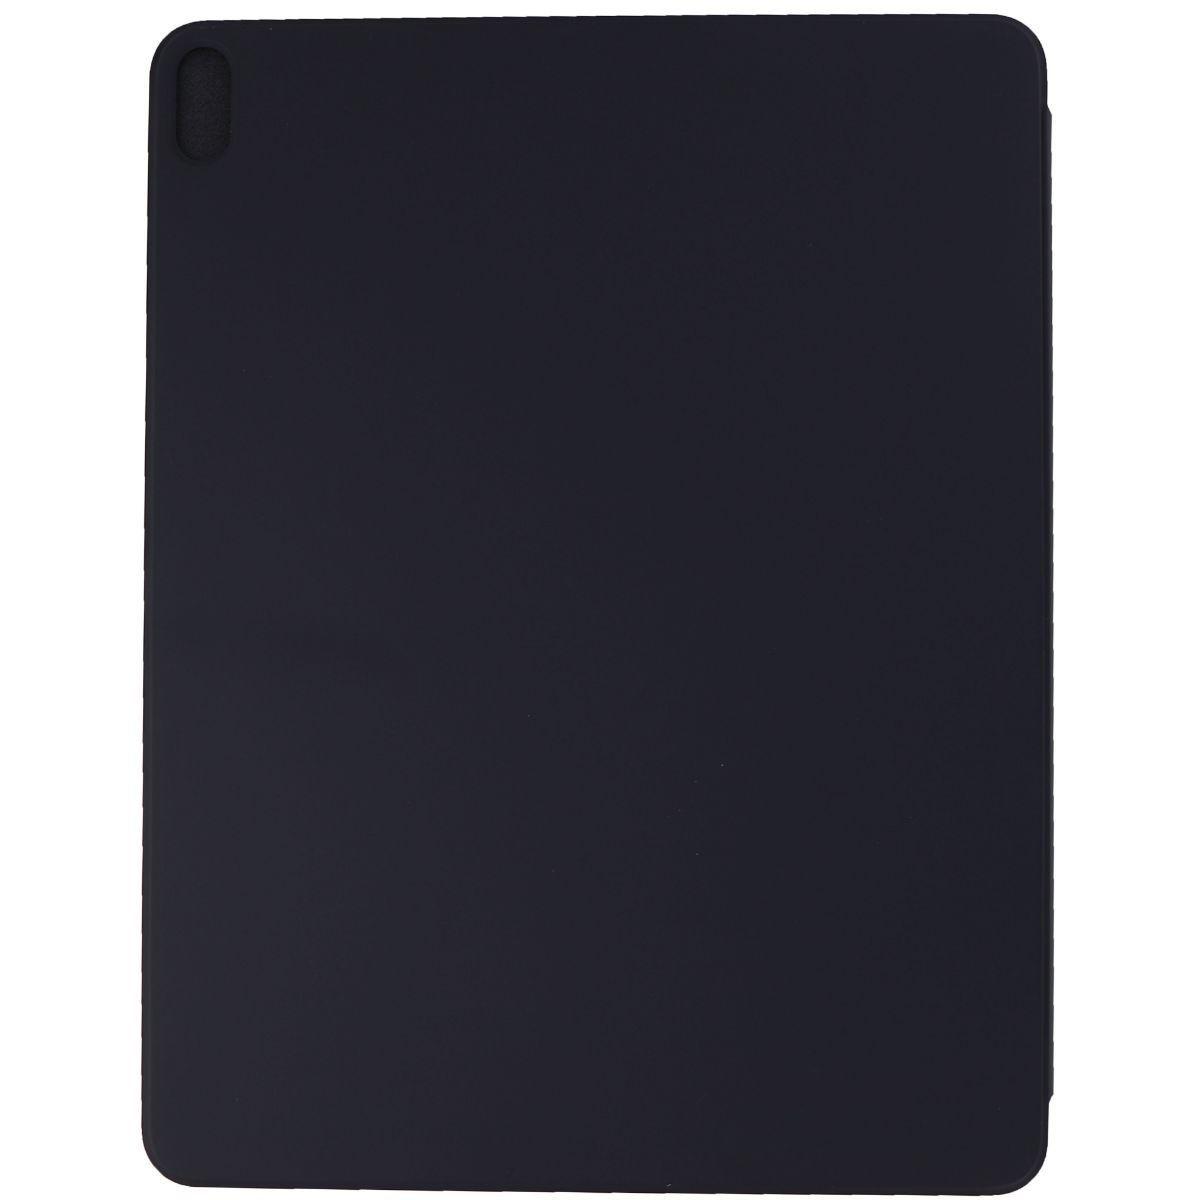 Apple Smart Folio Case for iPad Pro 12.9 (3rd Gen) - Charcoal Gray (MRXD2ZM/A)